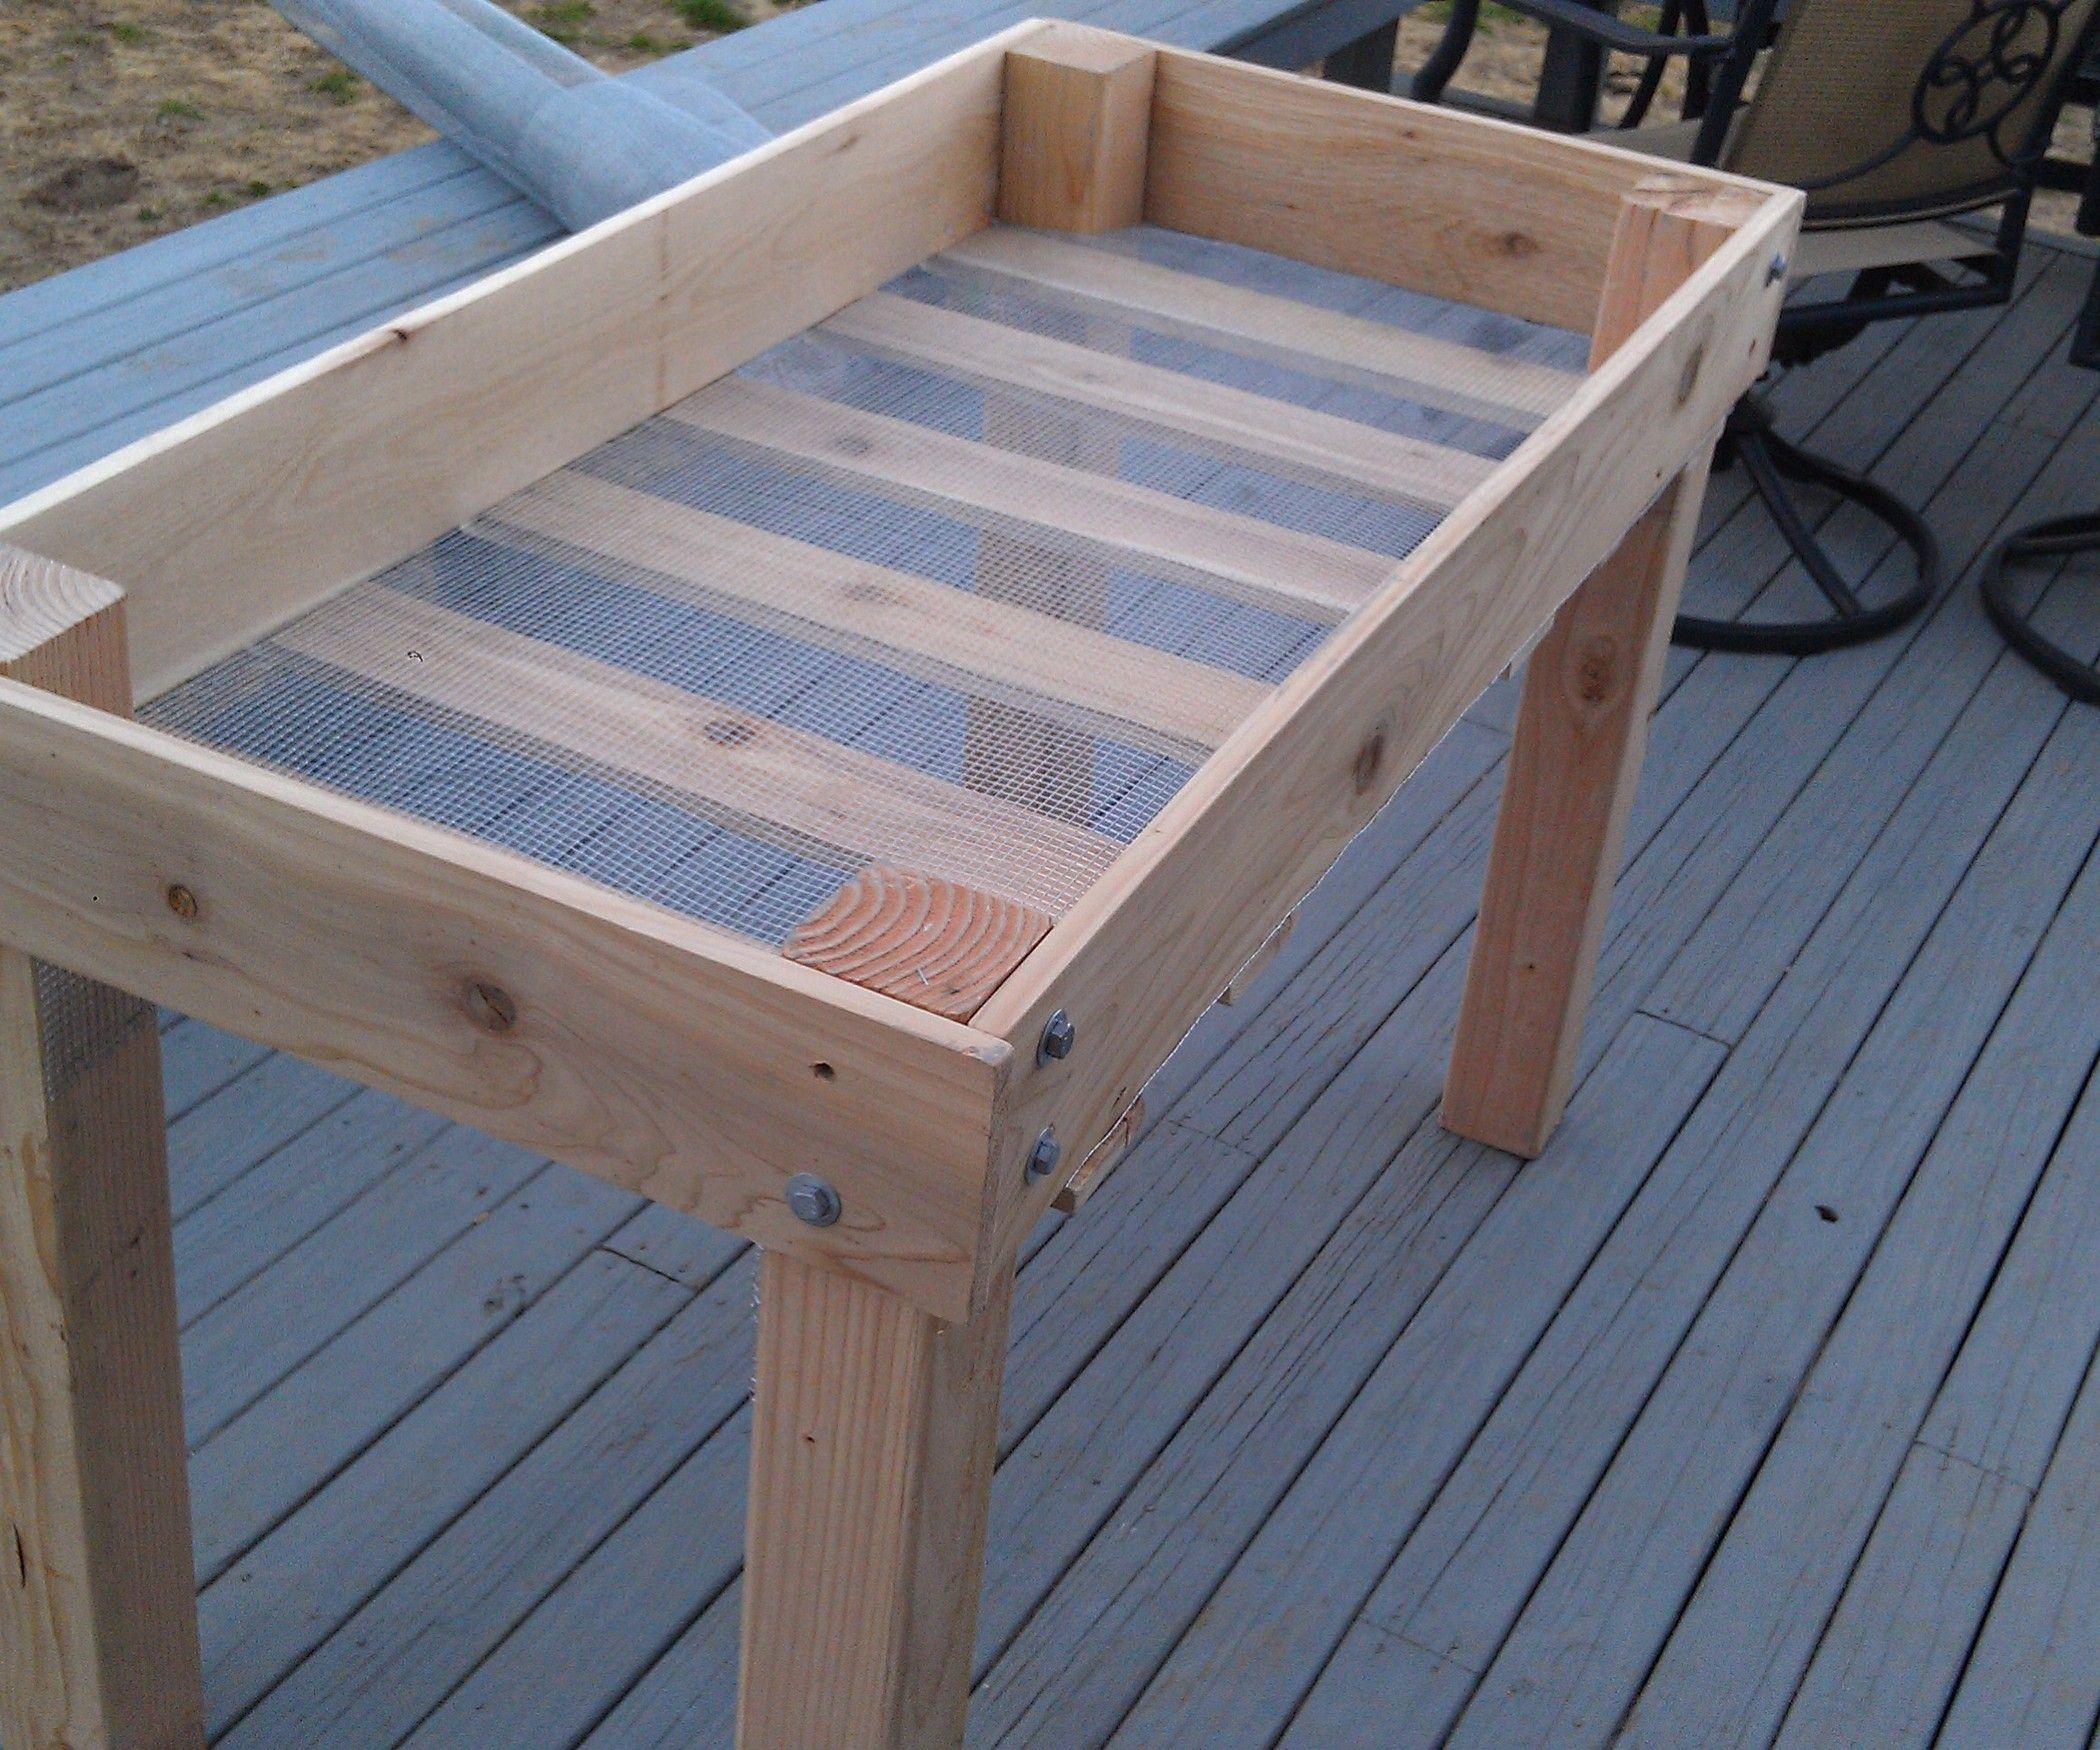 DIY Raised Bed Planter Raised planter beds, Planter beds